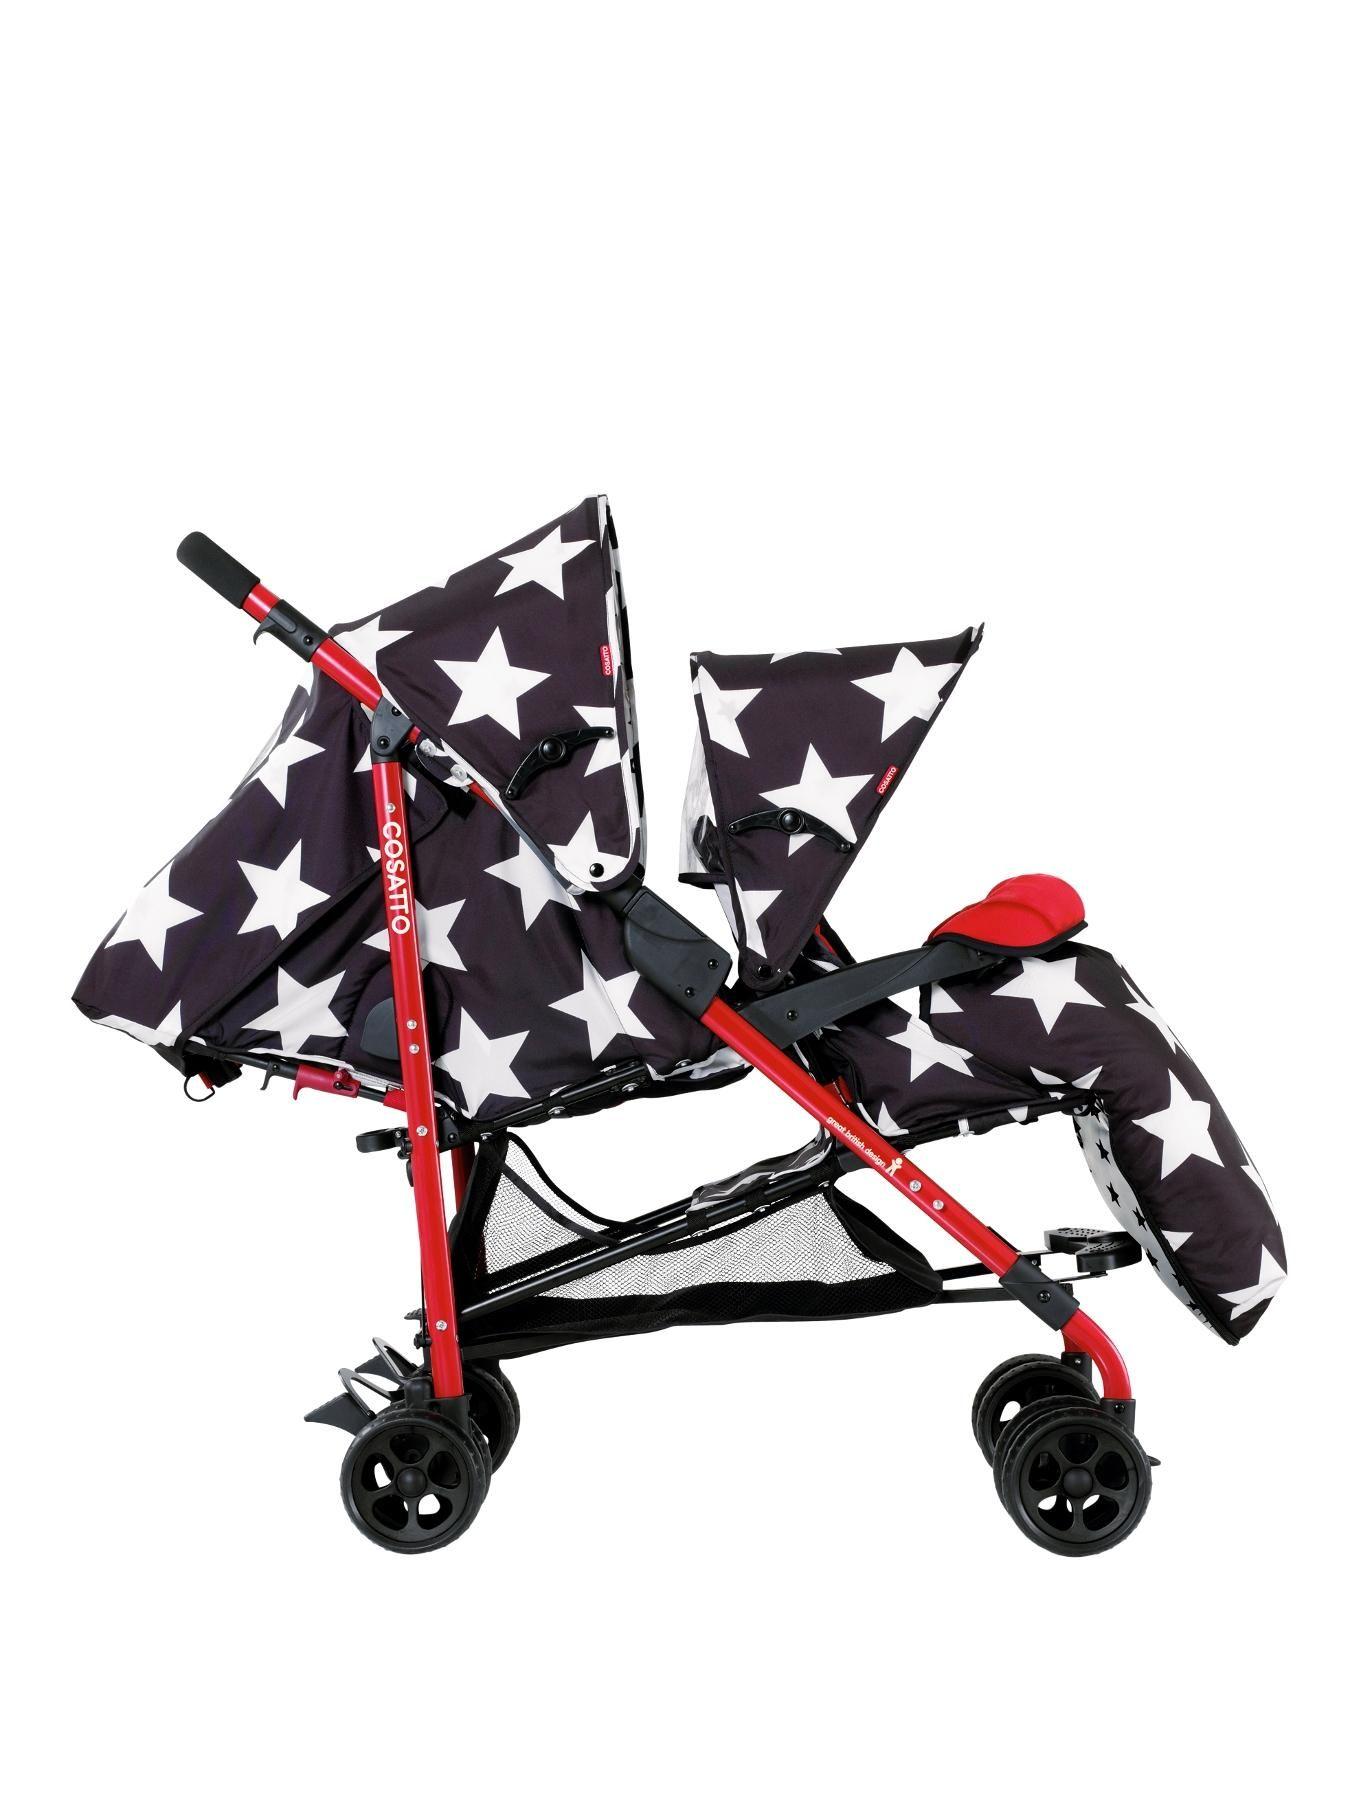 Kinderwagon Hop: Umbrella Double Stroller www.lifeandbaby.com ...